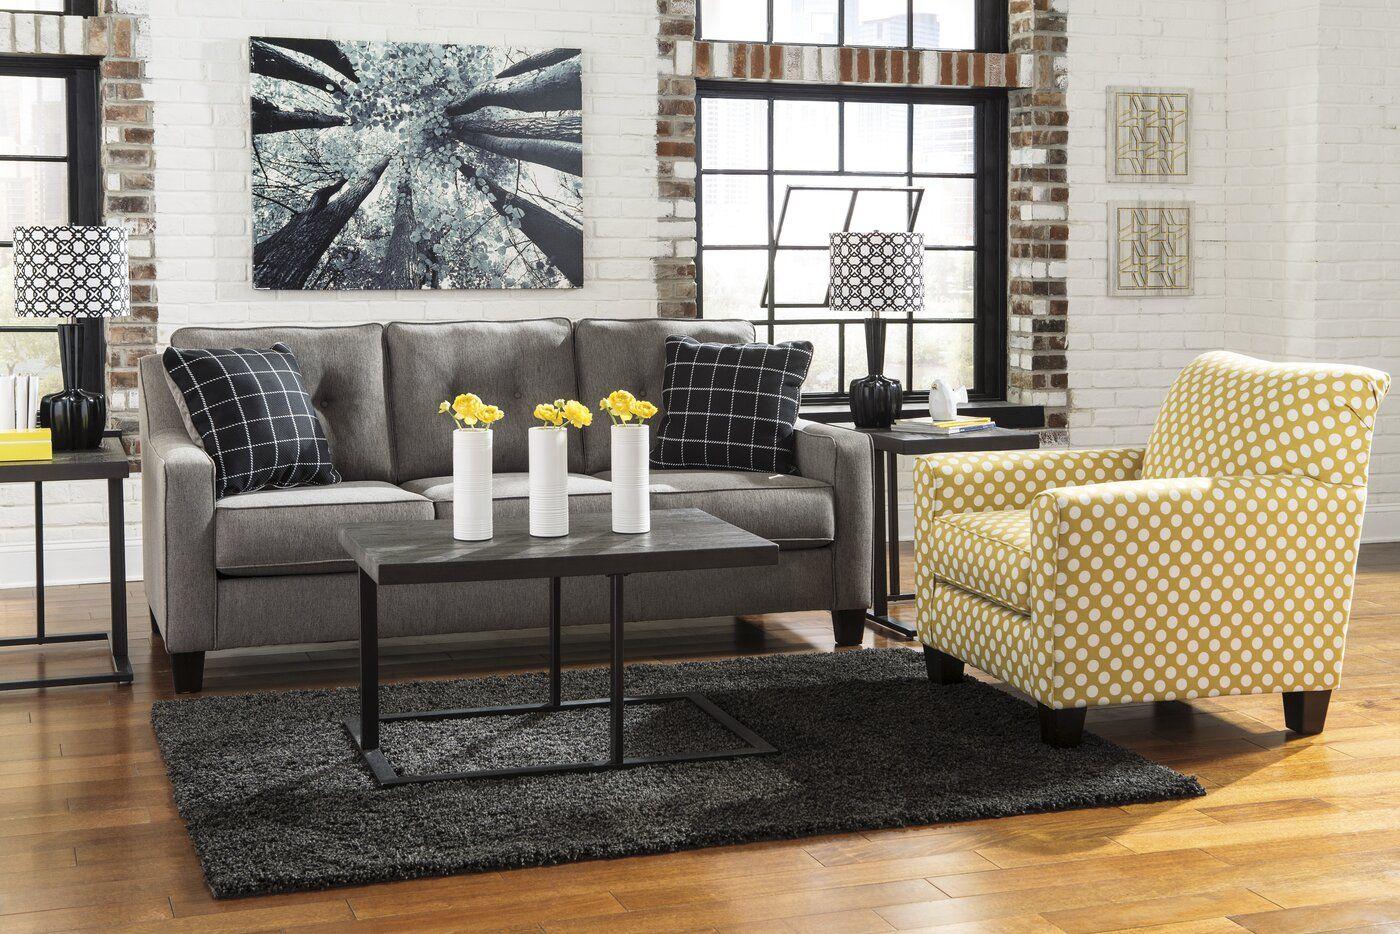 Adel Sofa Bed  Cheap living room sets, Furniture, Living room